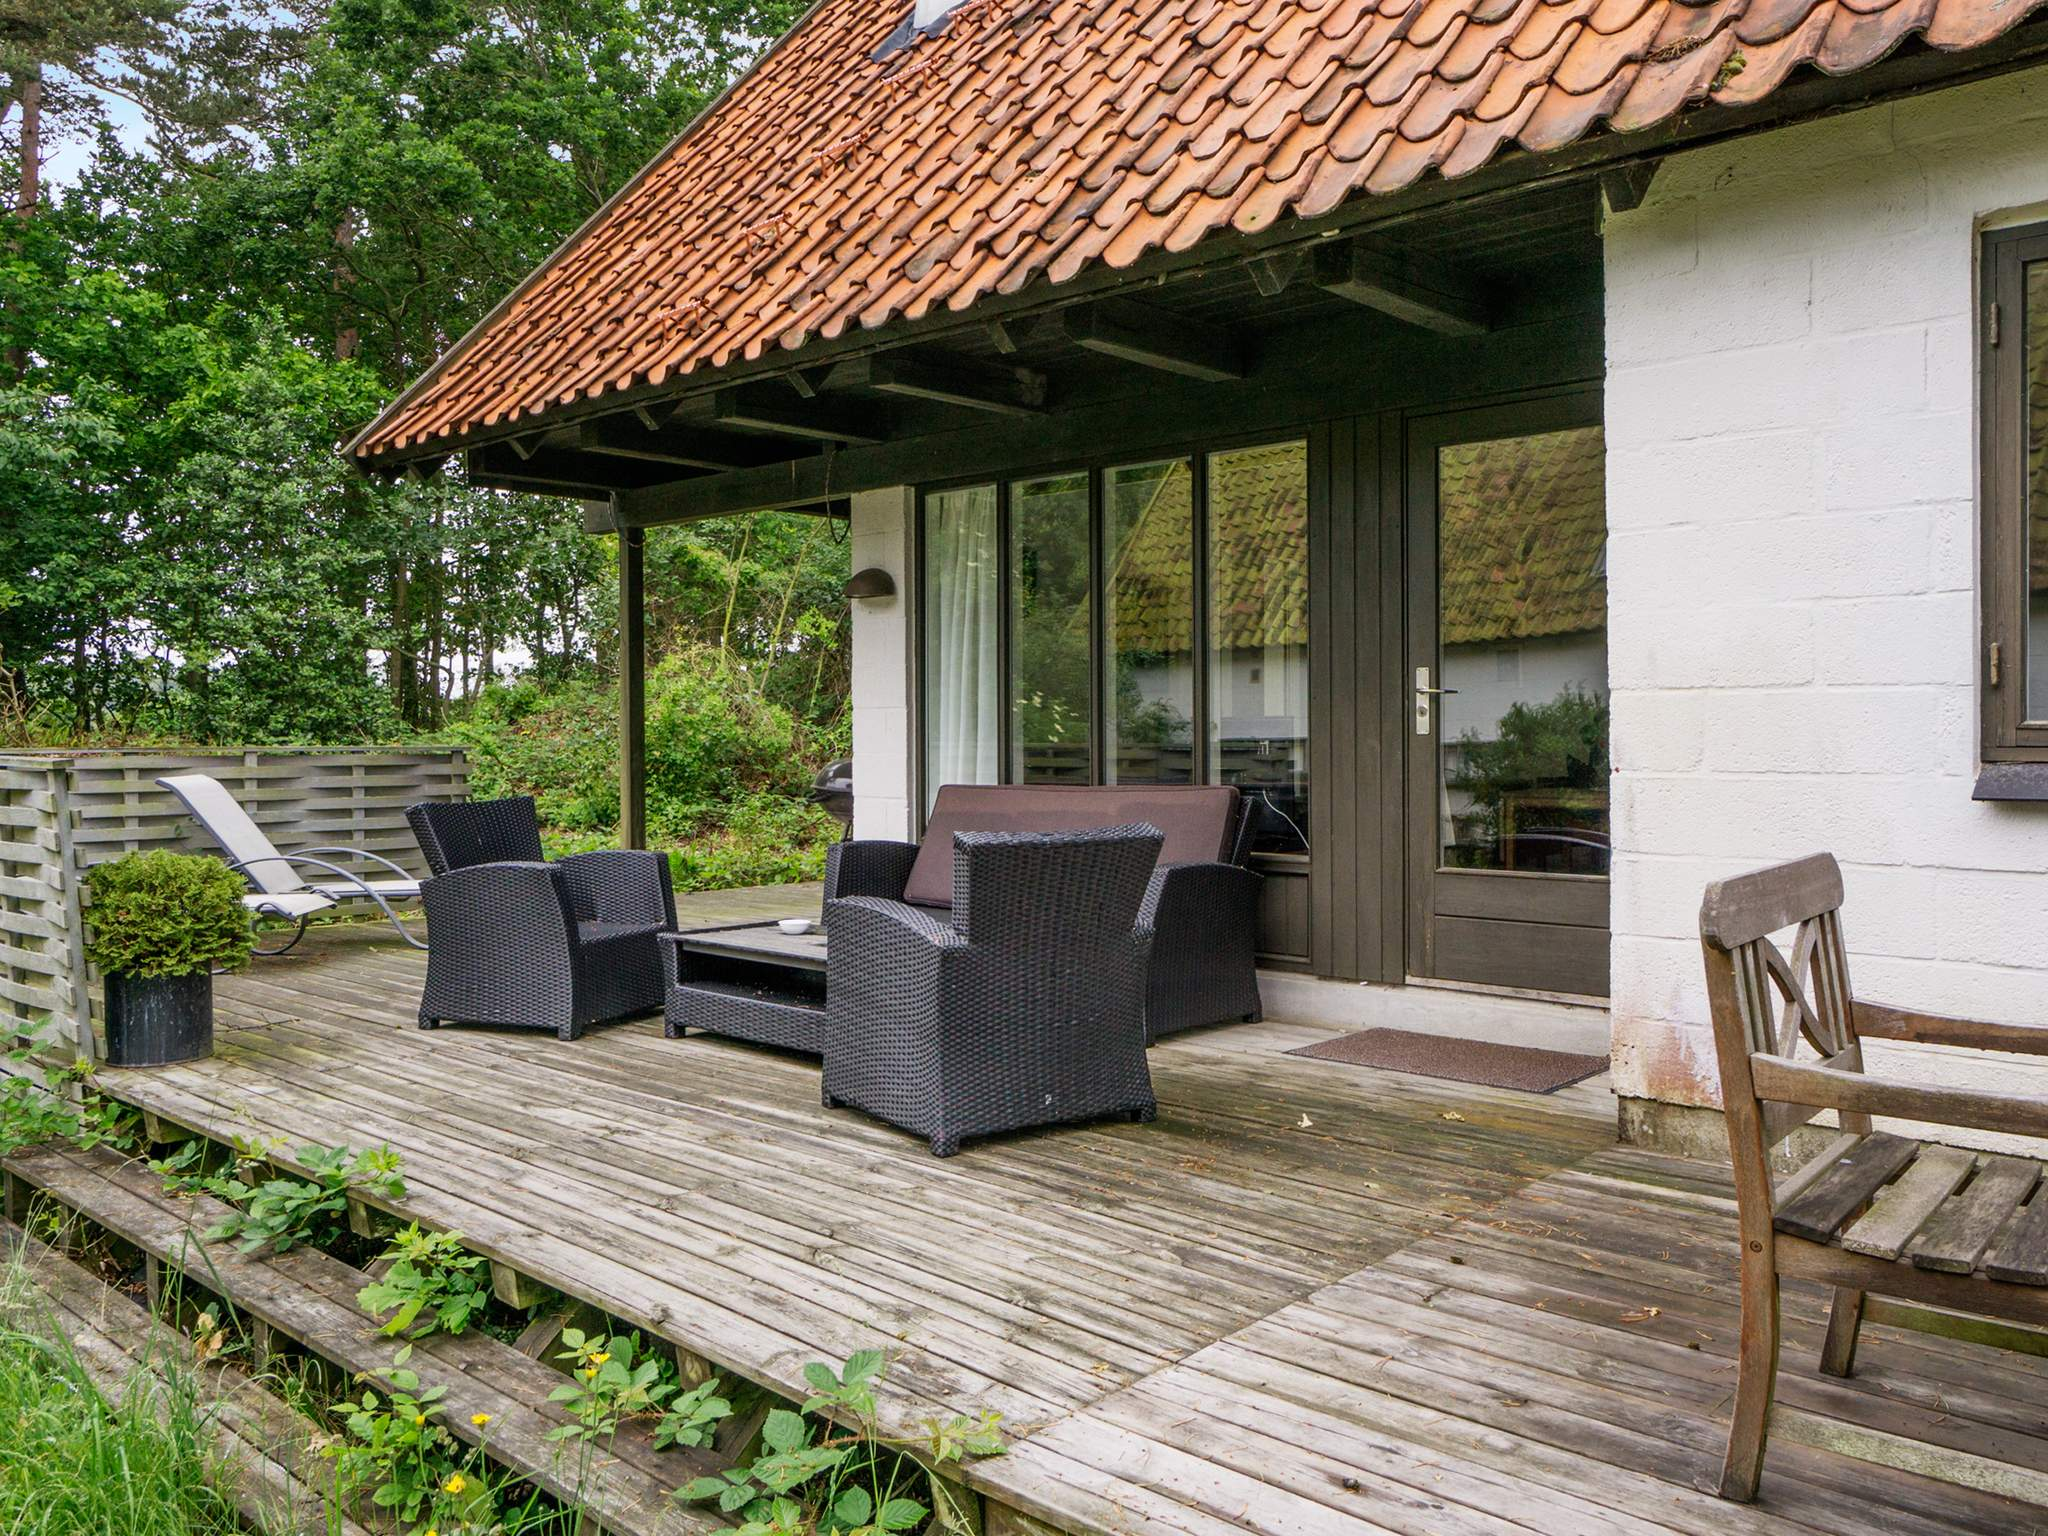 Ferienhaus Balka Strand (660138), Balke, , Bornholm, Dänemark, Bild 11